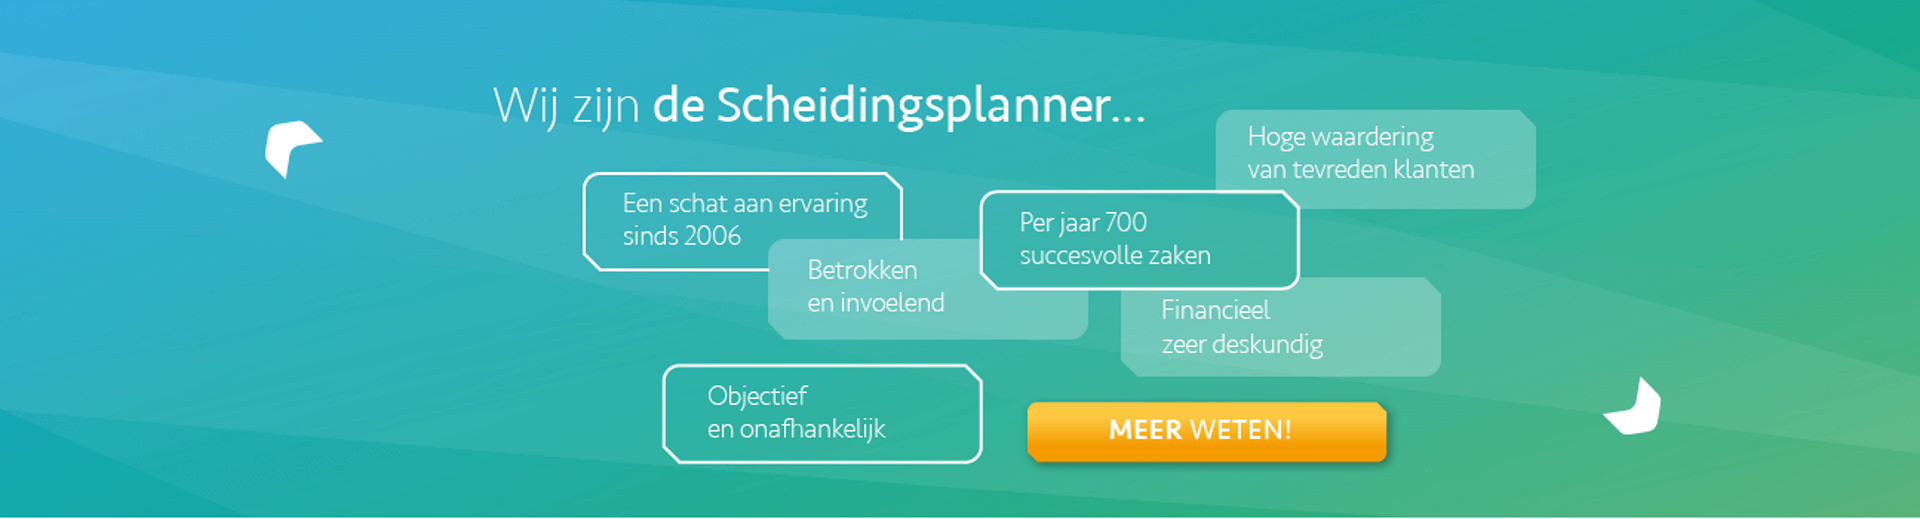 Waarom de Scheidingsplanner - Scheidingsplanner Almelo - Deventer - Nijverdal